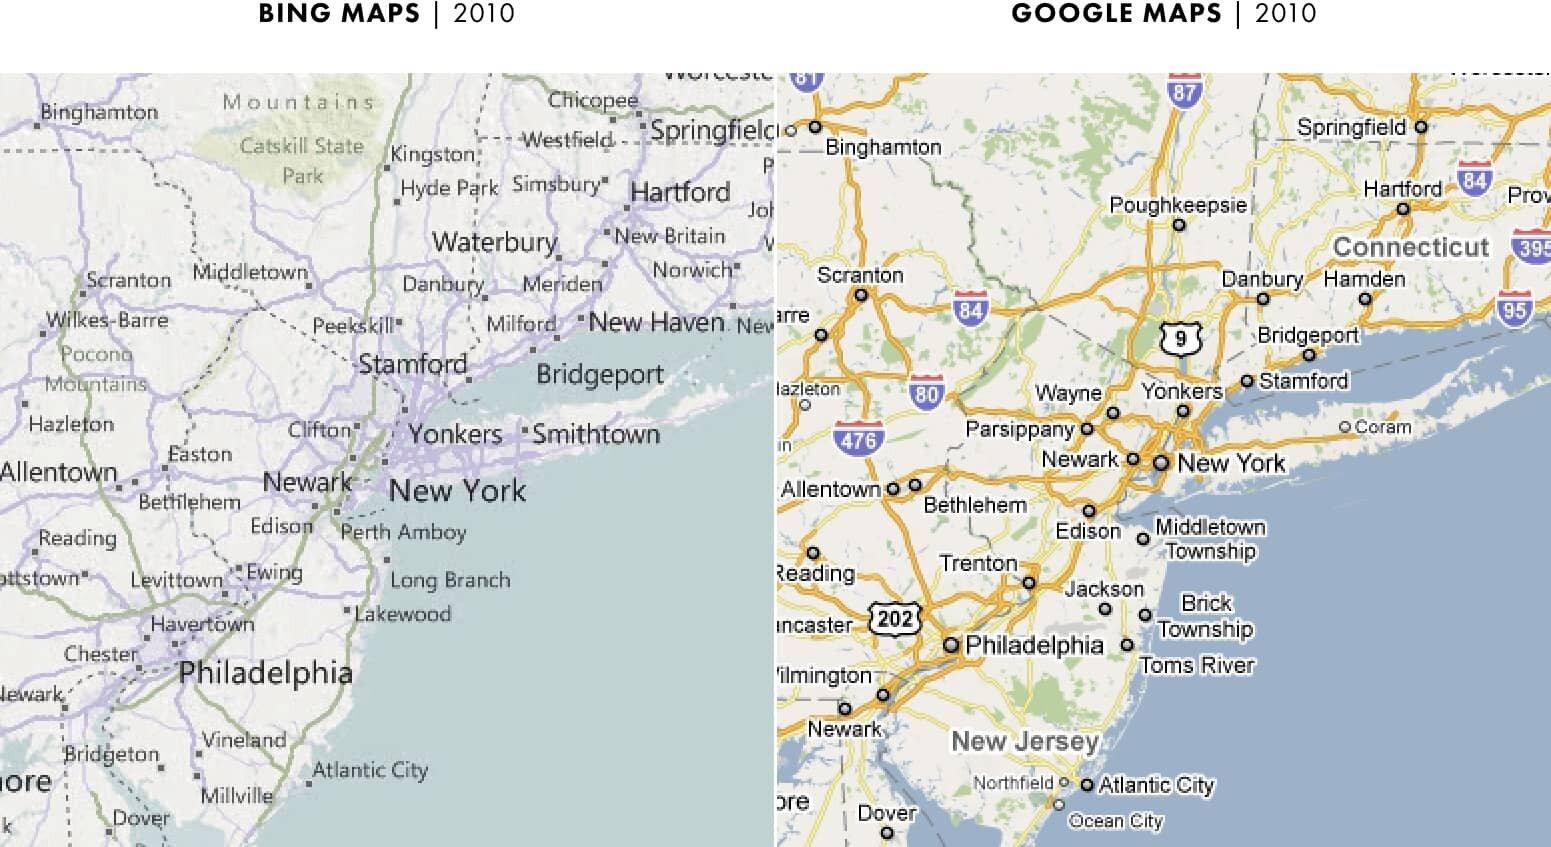 3 Cartography Change - Bing Maps 2010 vs Google Maps 2010.jpg